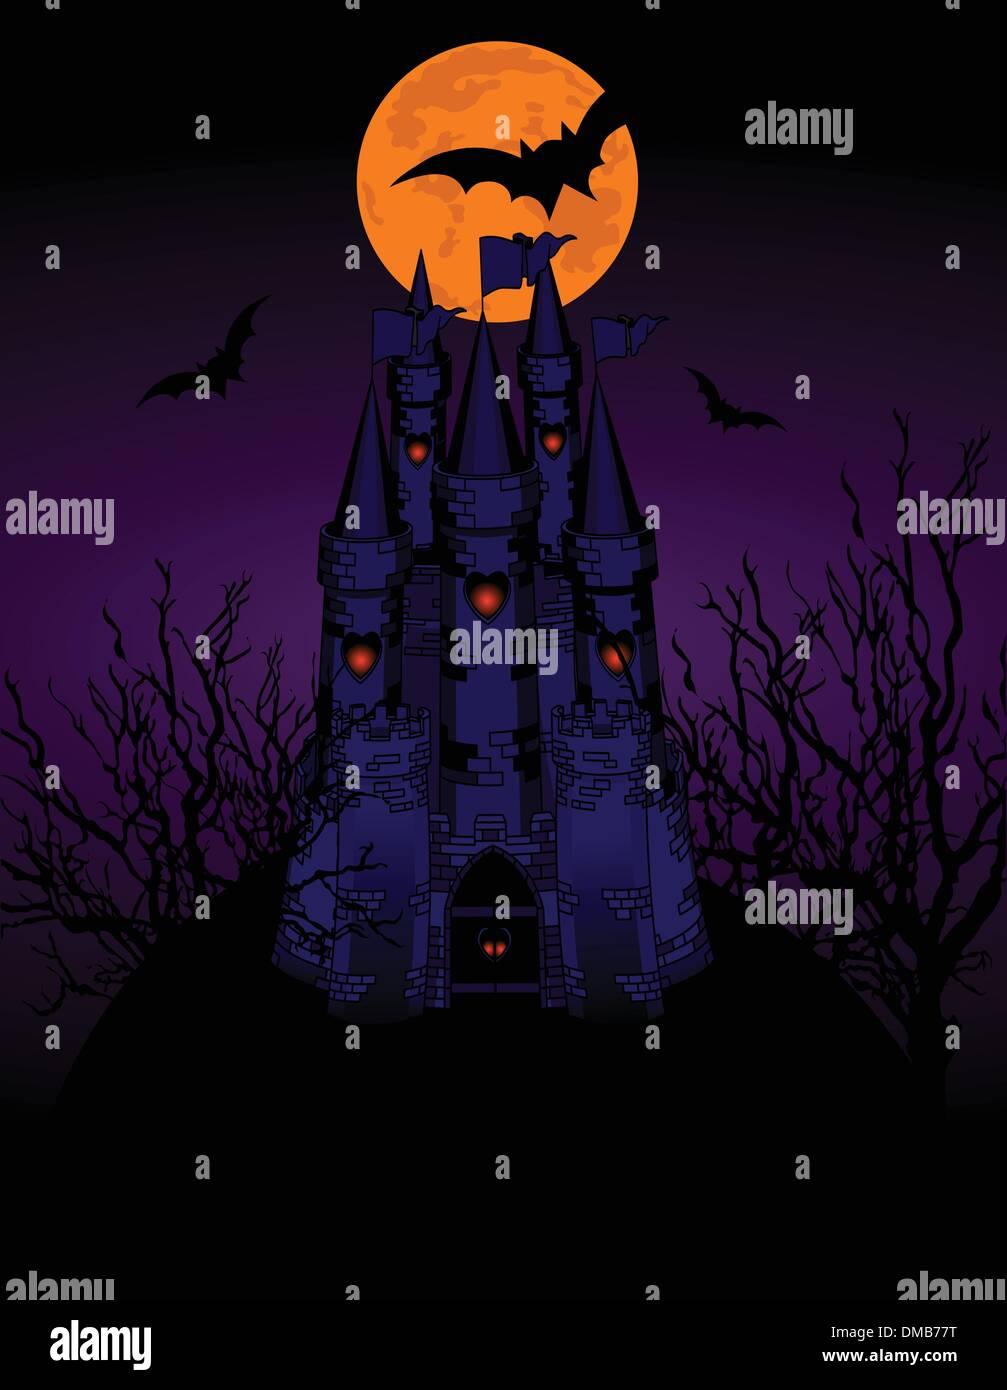 Haunted Castle invitation card - Stock Image